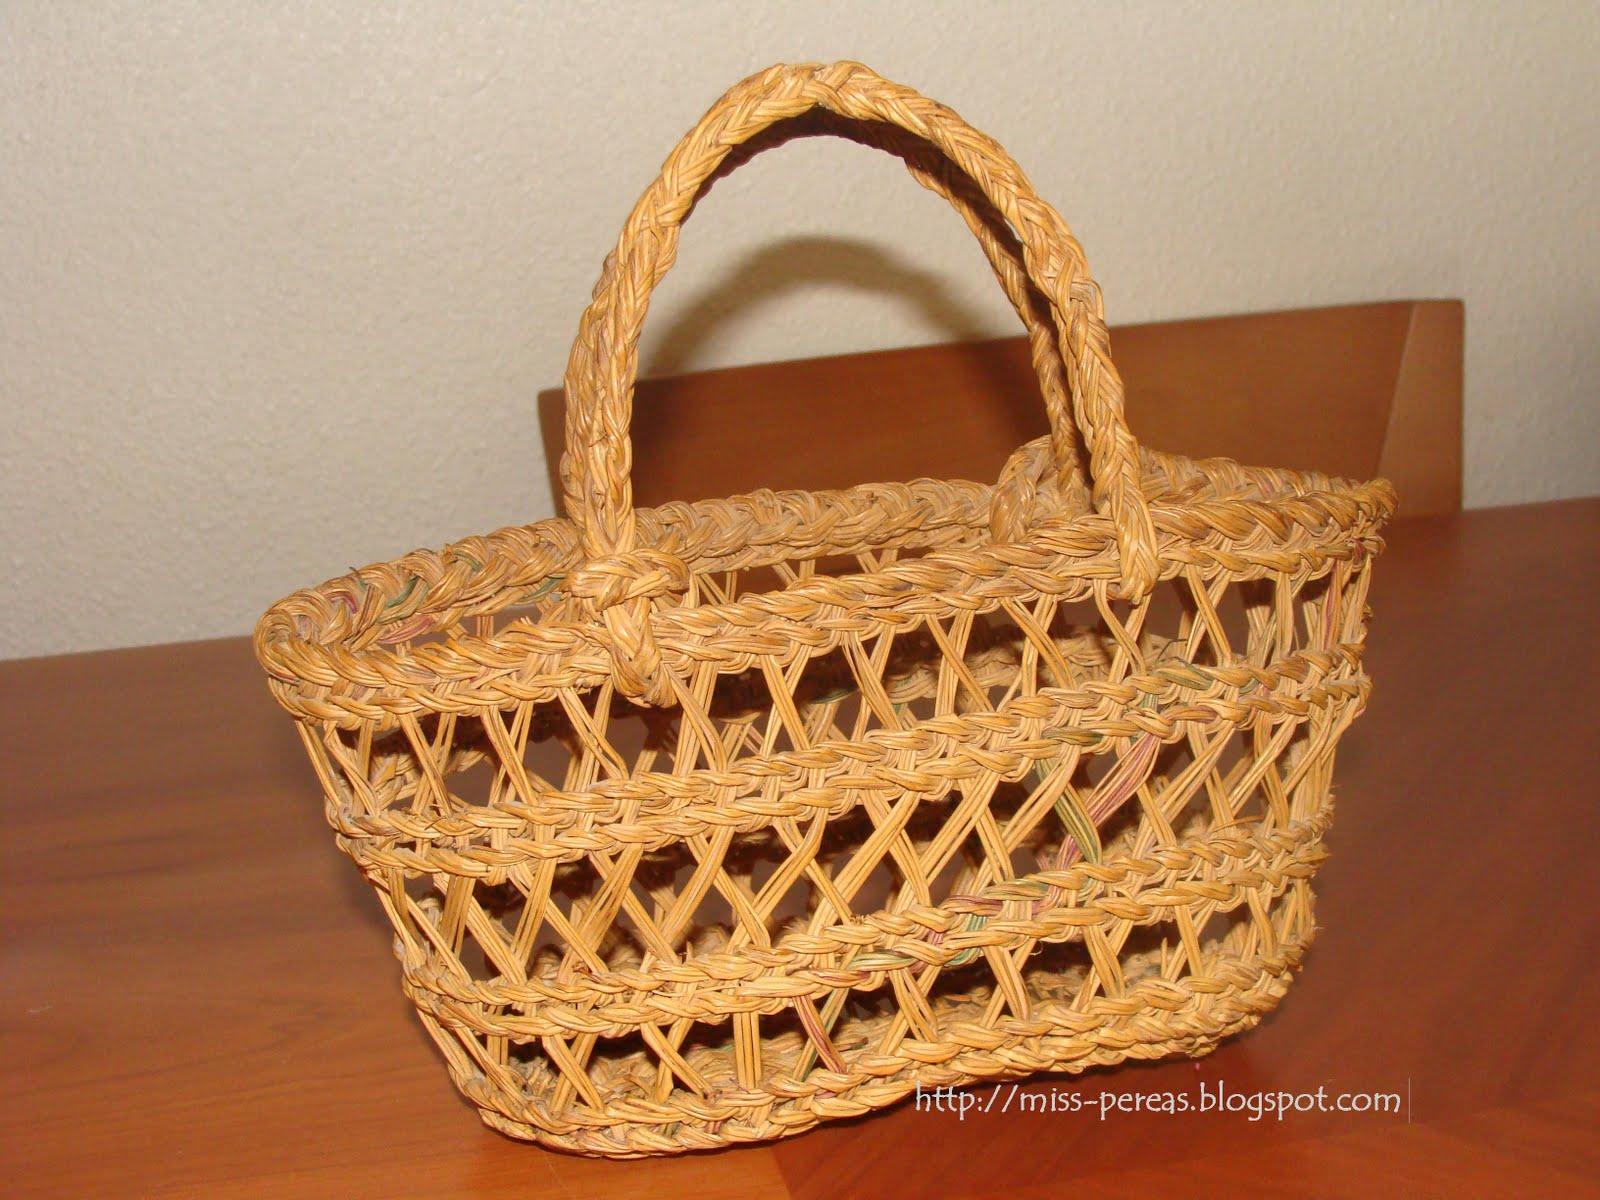 Miss perea 39 s cesta de esparto - Cestas de esparto ...